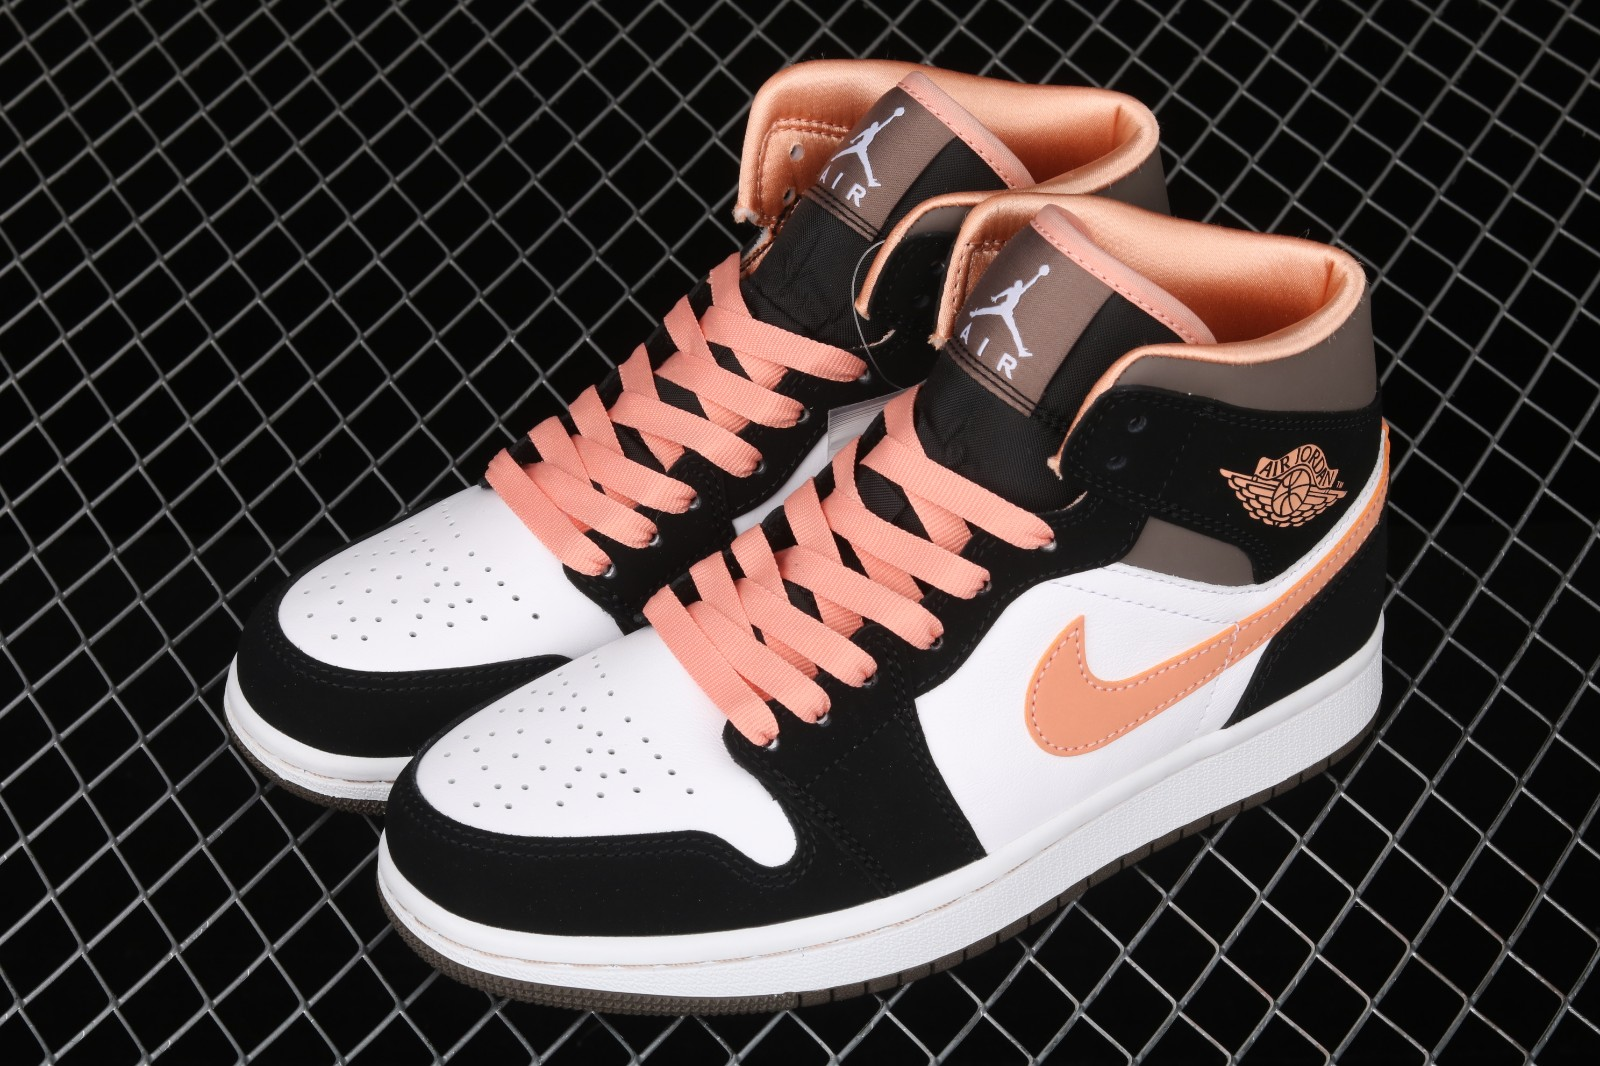 Wmns Air Jordan 1 Mid SE 'Peach Mocha'